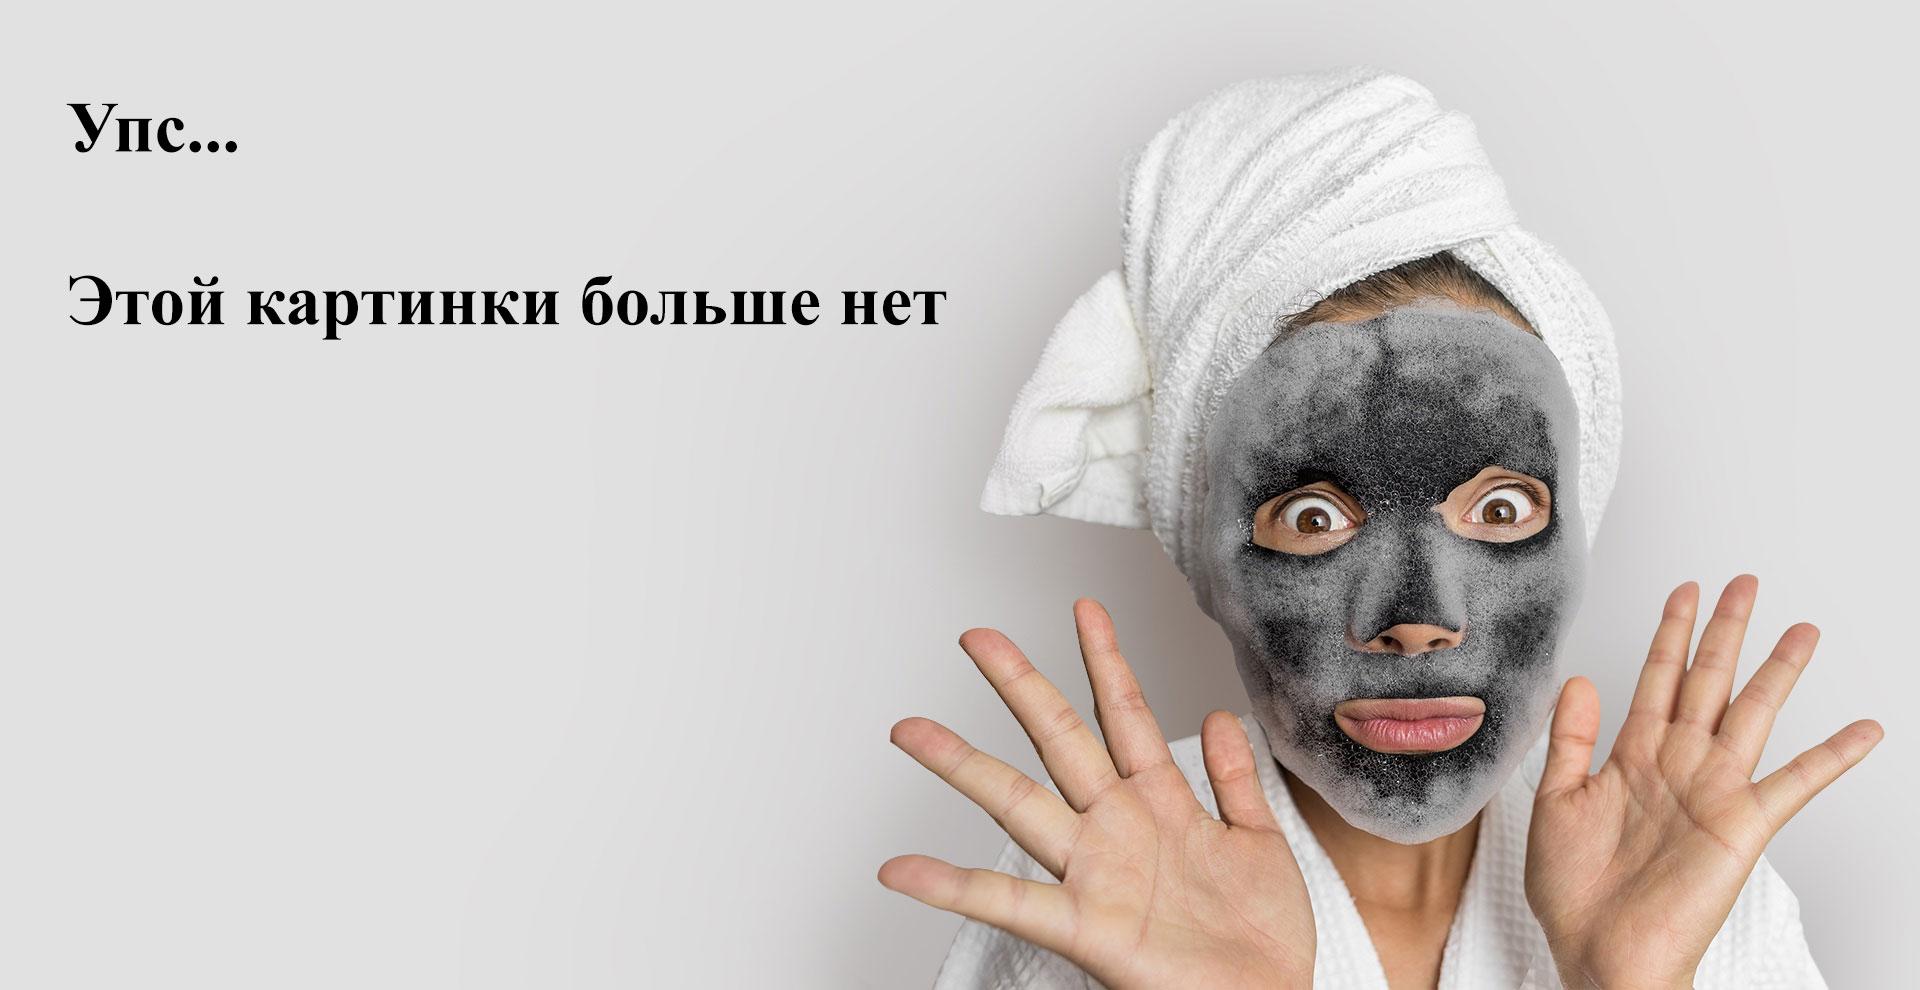 Holika Holika, Гель отшелушивающий «Смузи Пилинг» Яблоко, 120 мл